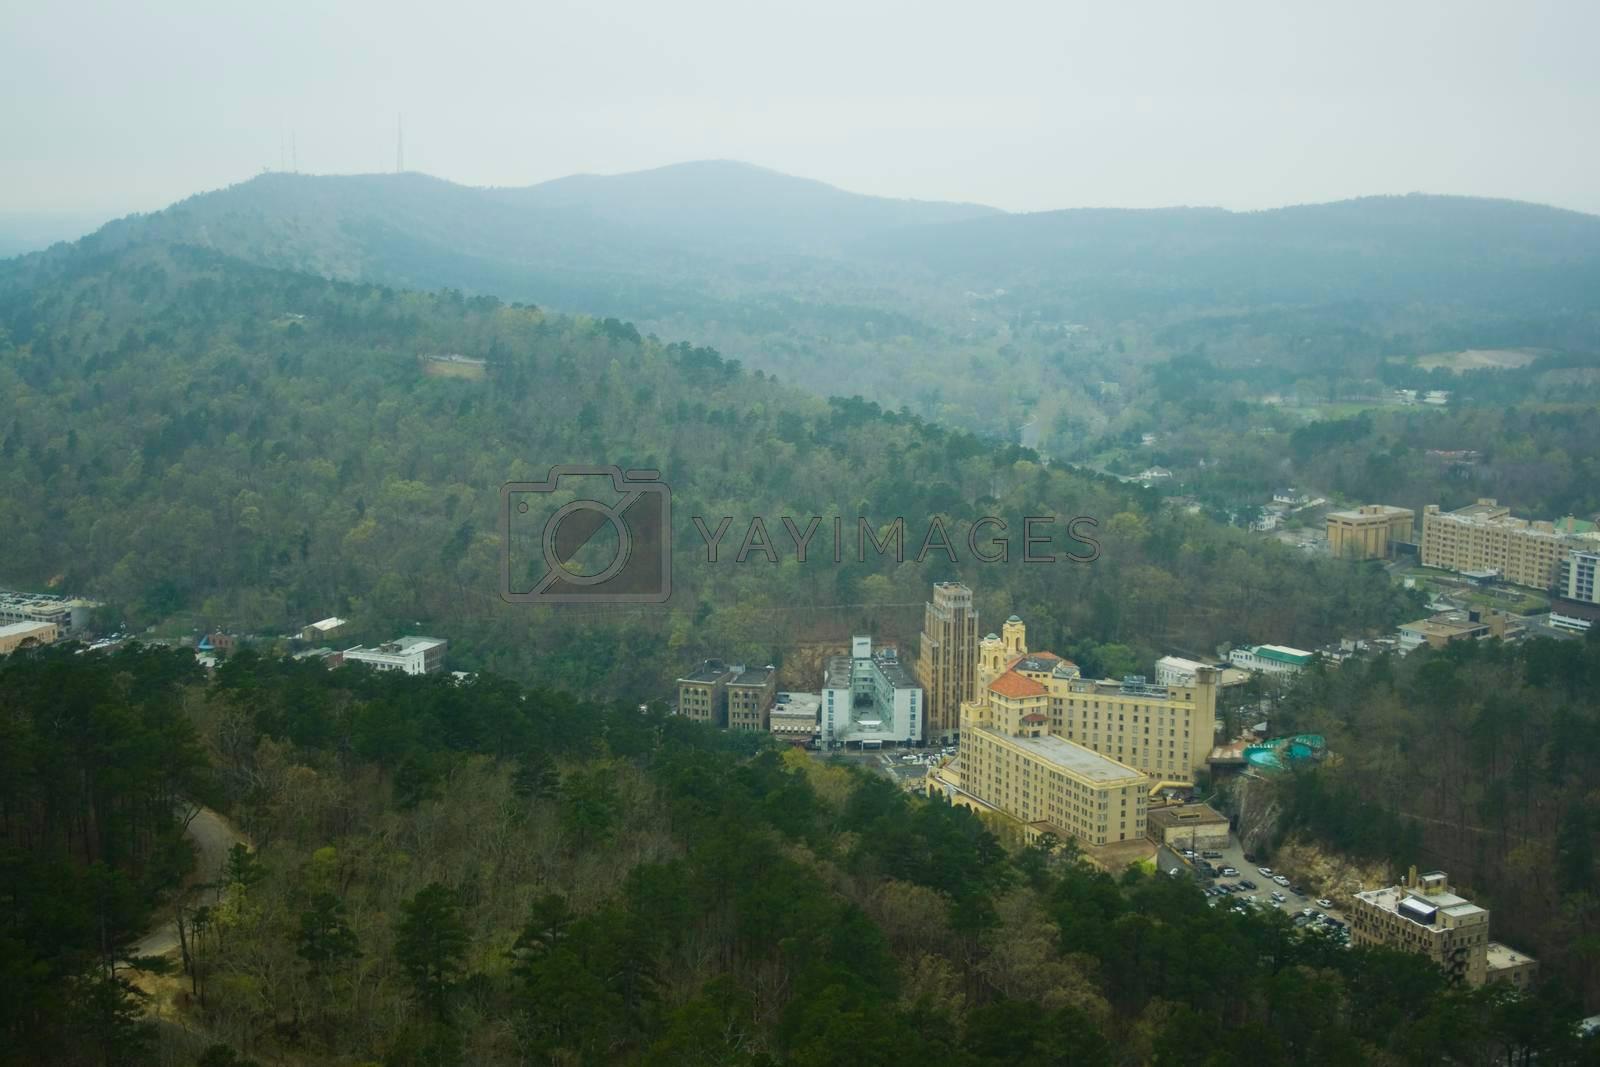 Views of Hot Springs National Park in Arkansas